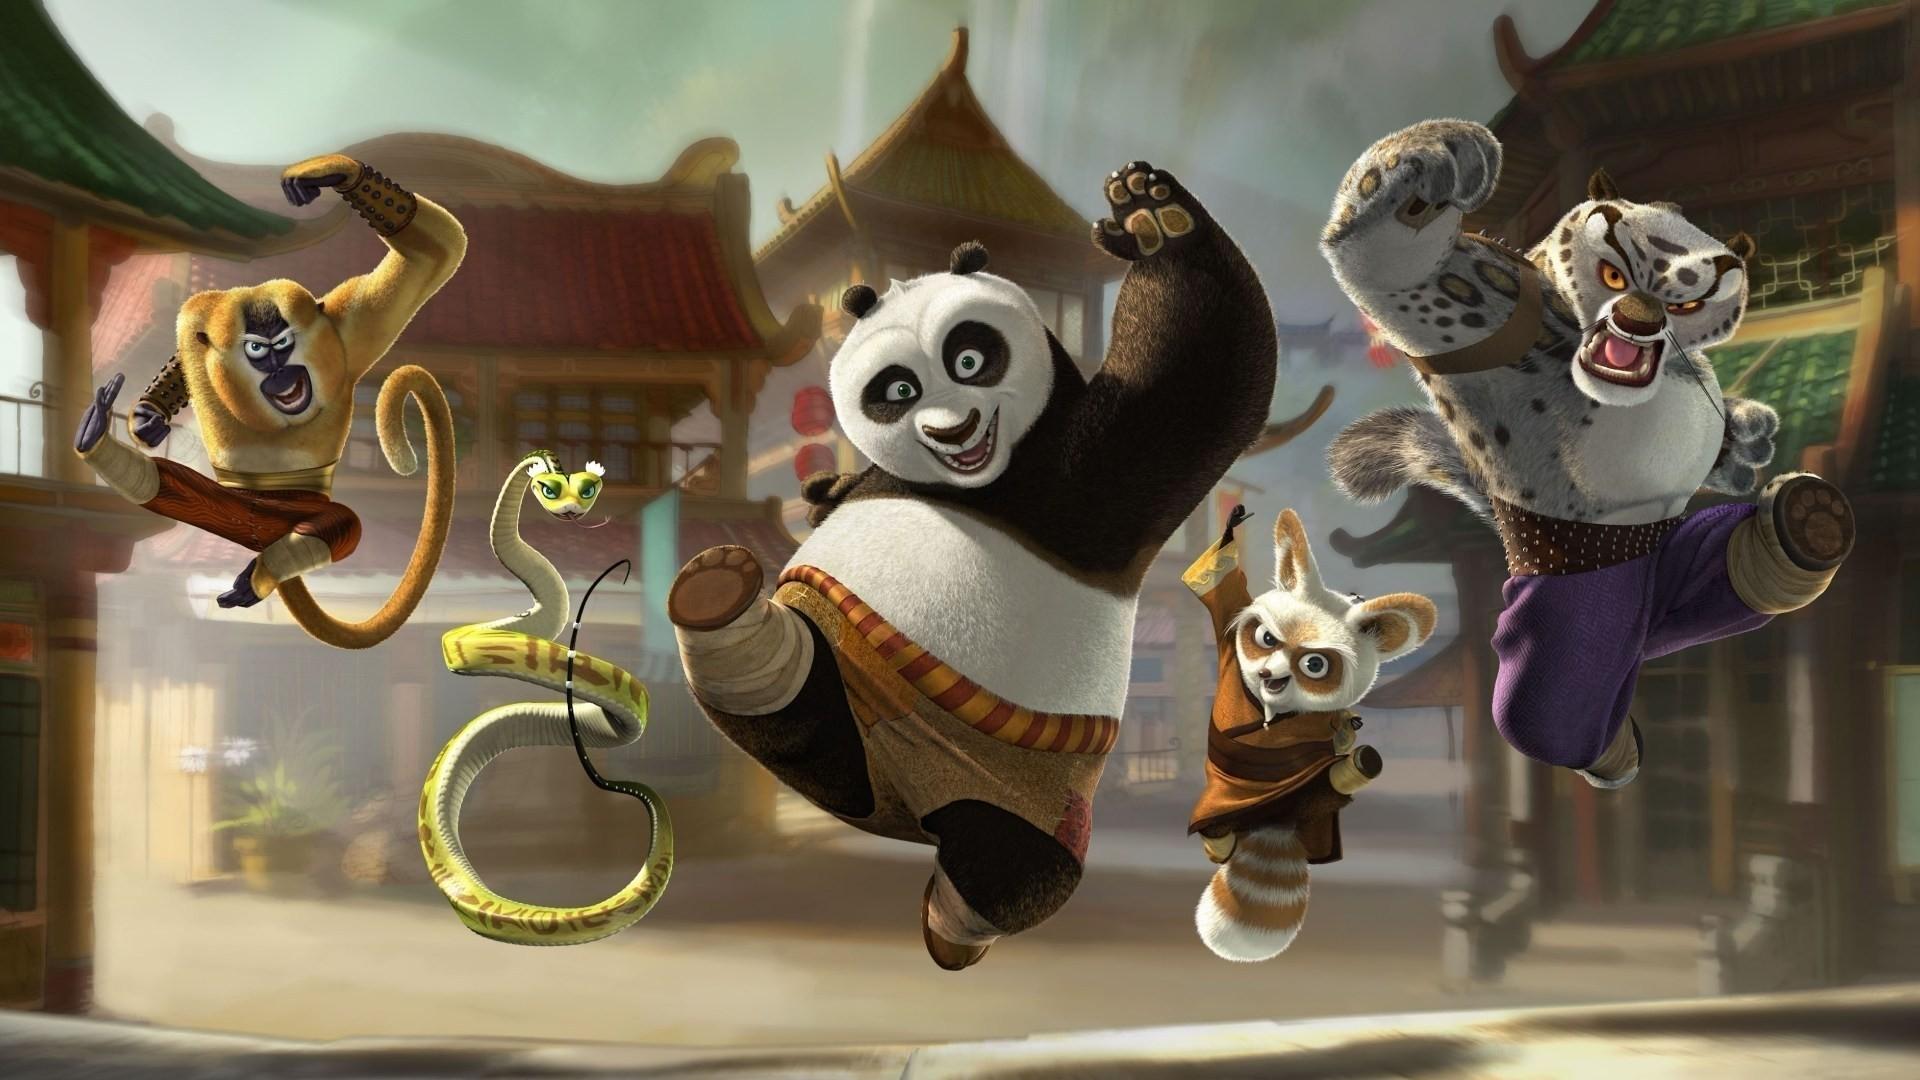 Kung Fu Panda wallpaper theme